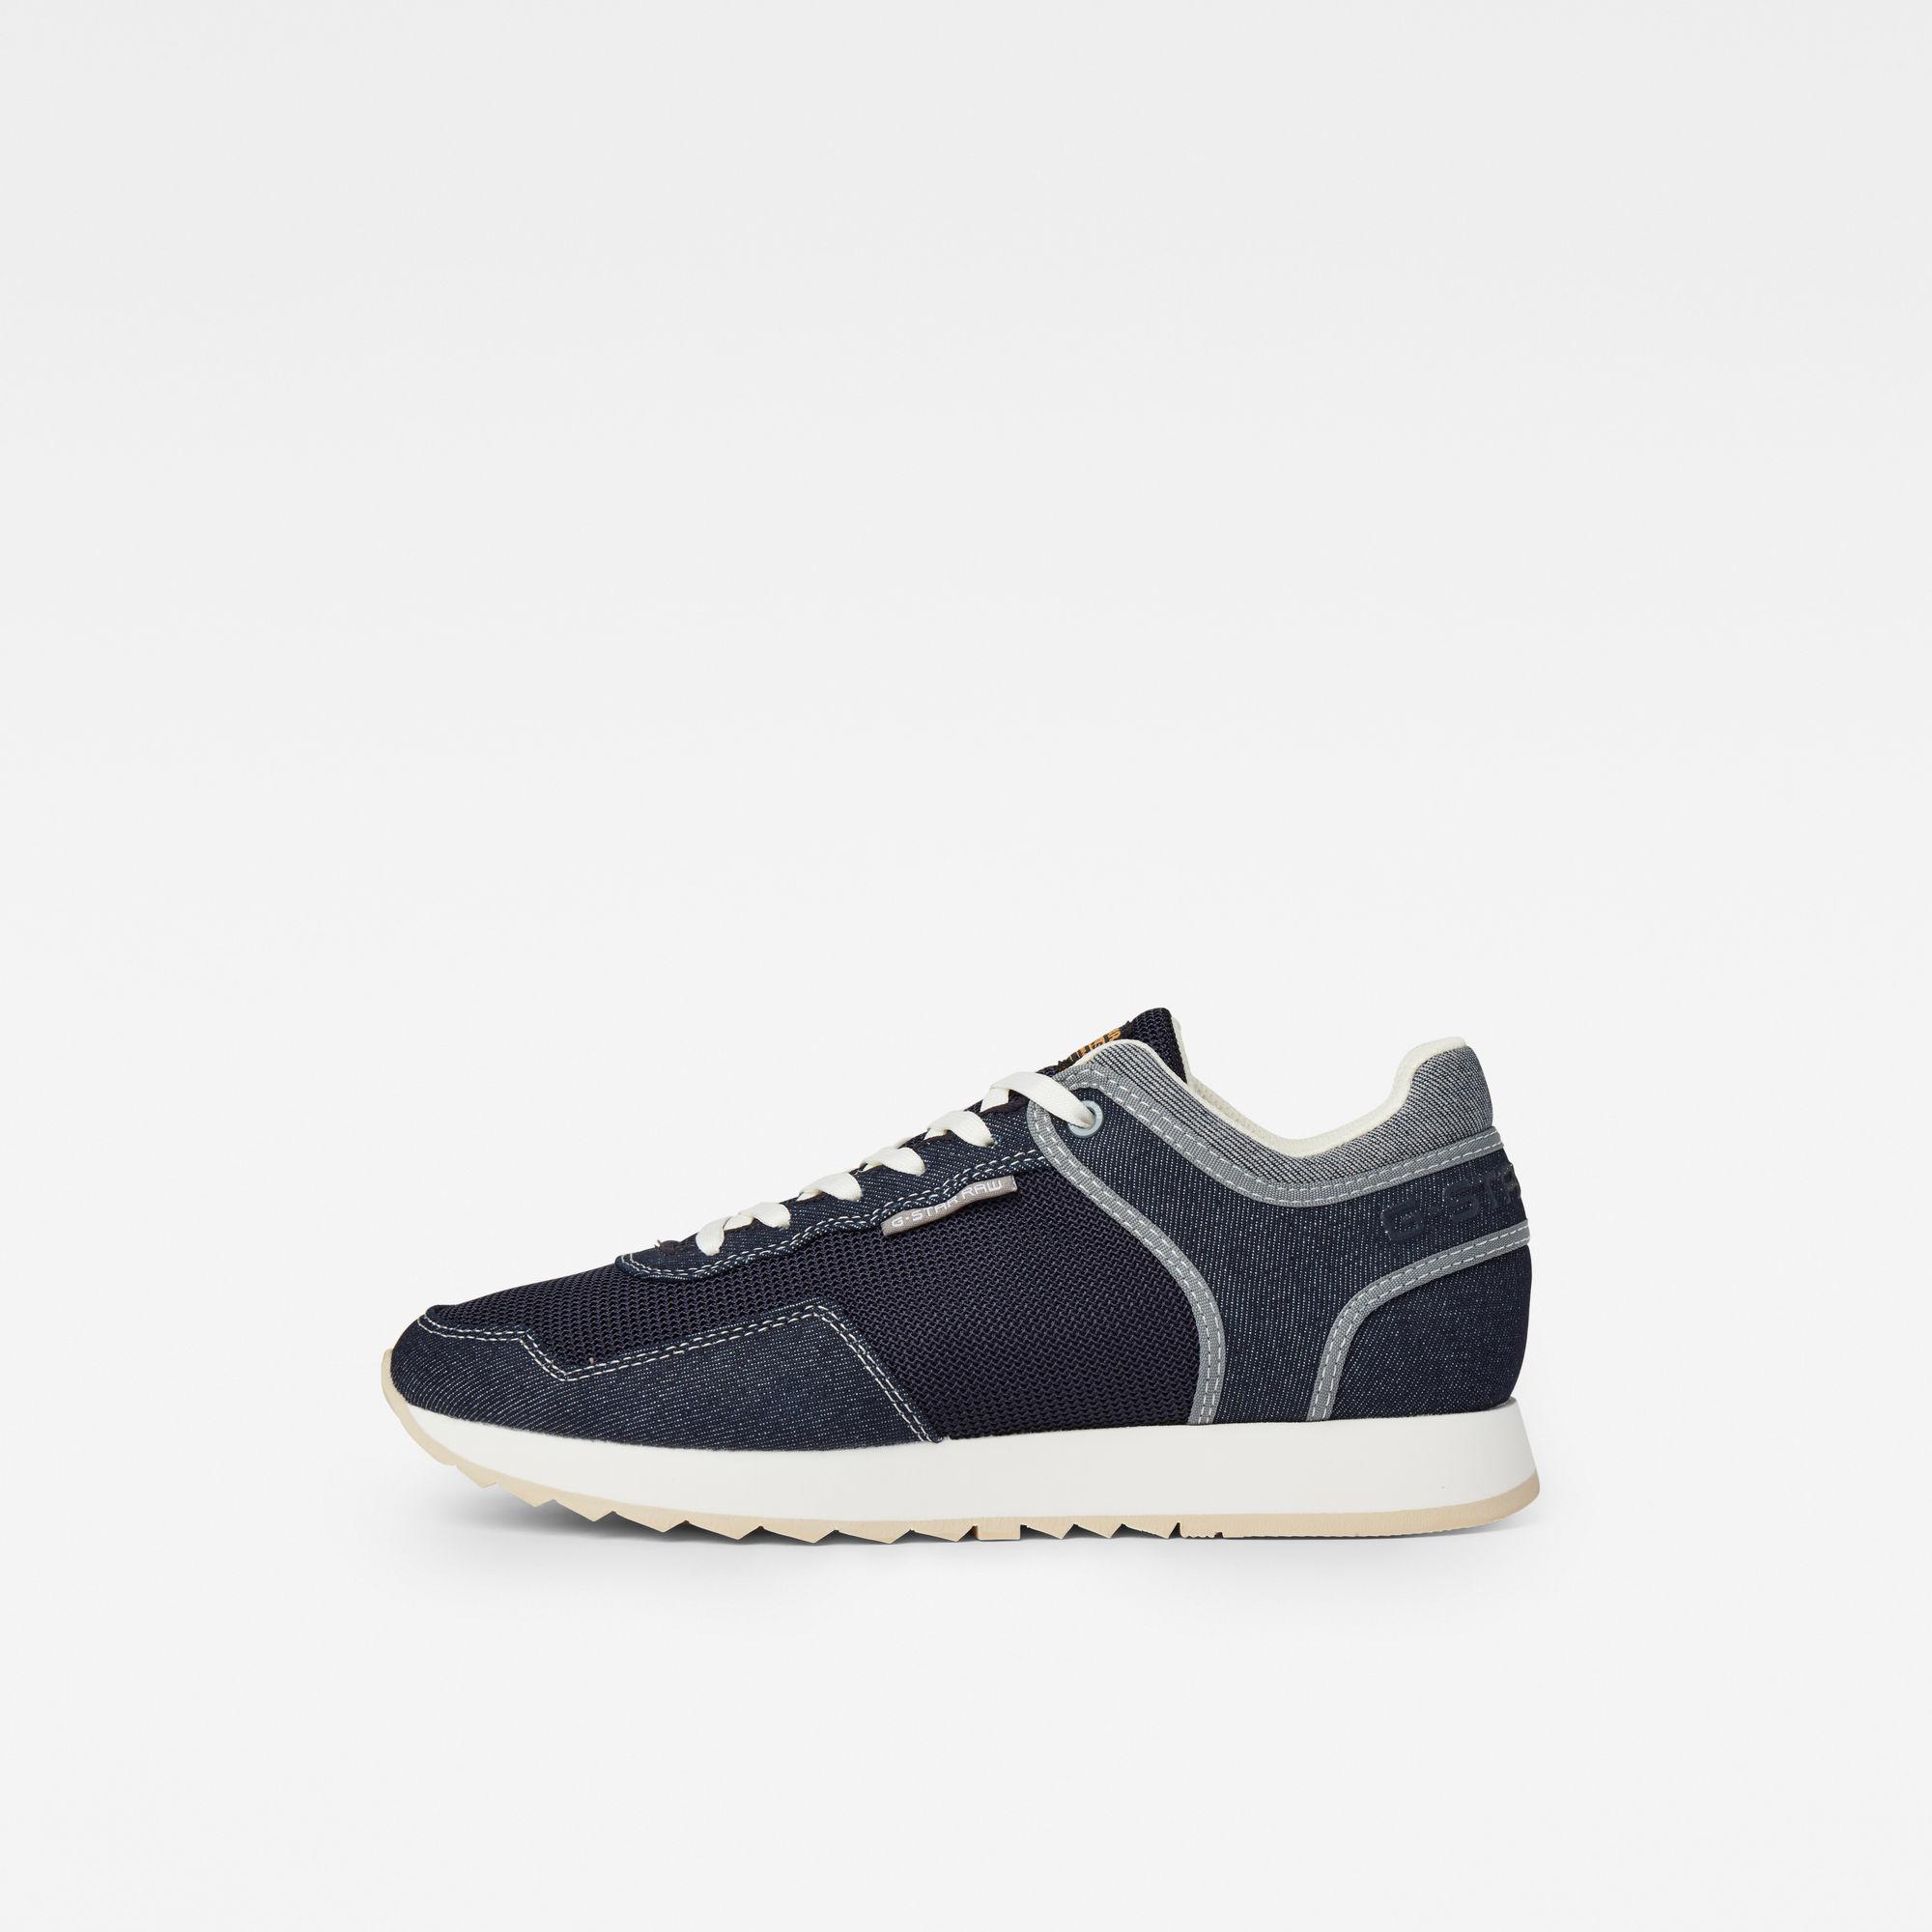 G-Star RAW Heren Calow Sneakers Donkerblauw